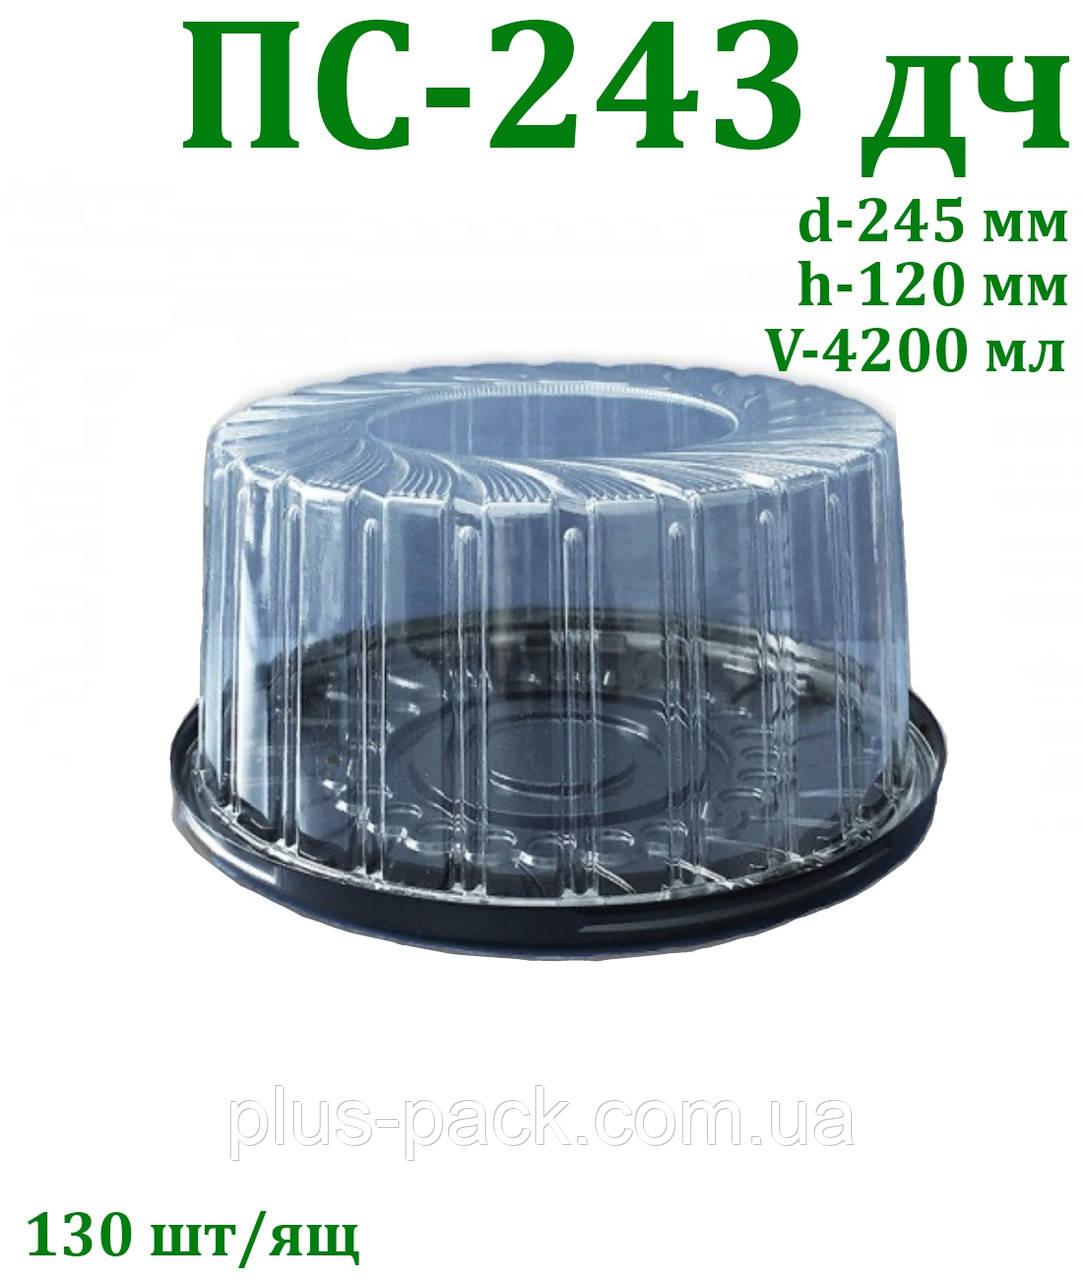 Одноразовая коробка для тортов ПС-243 дч (1 кг)